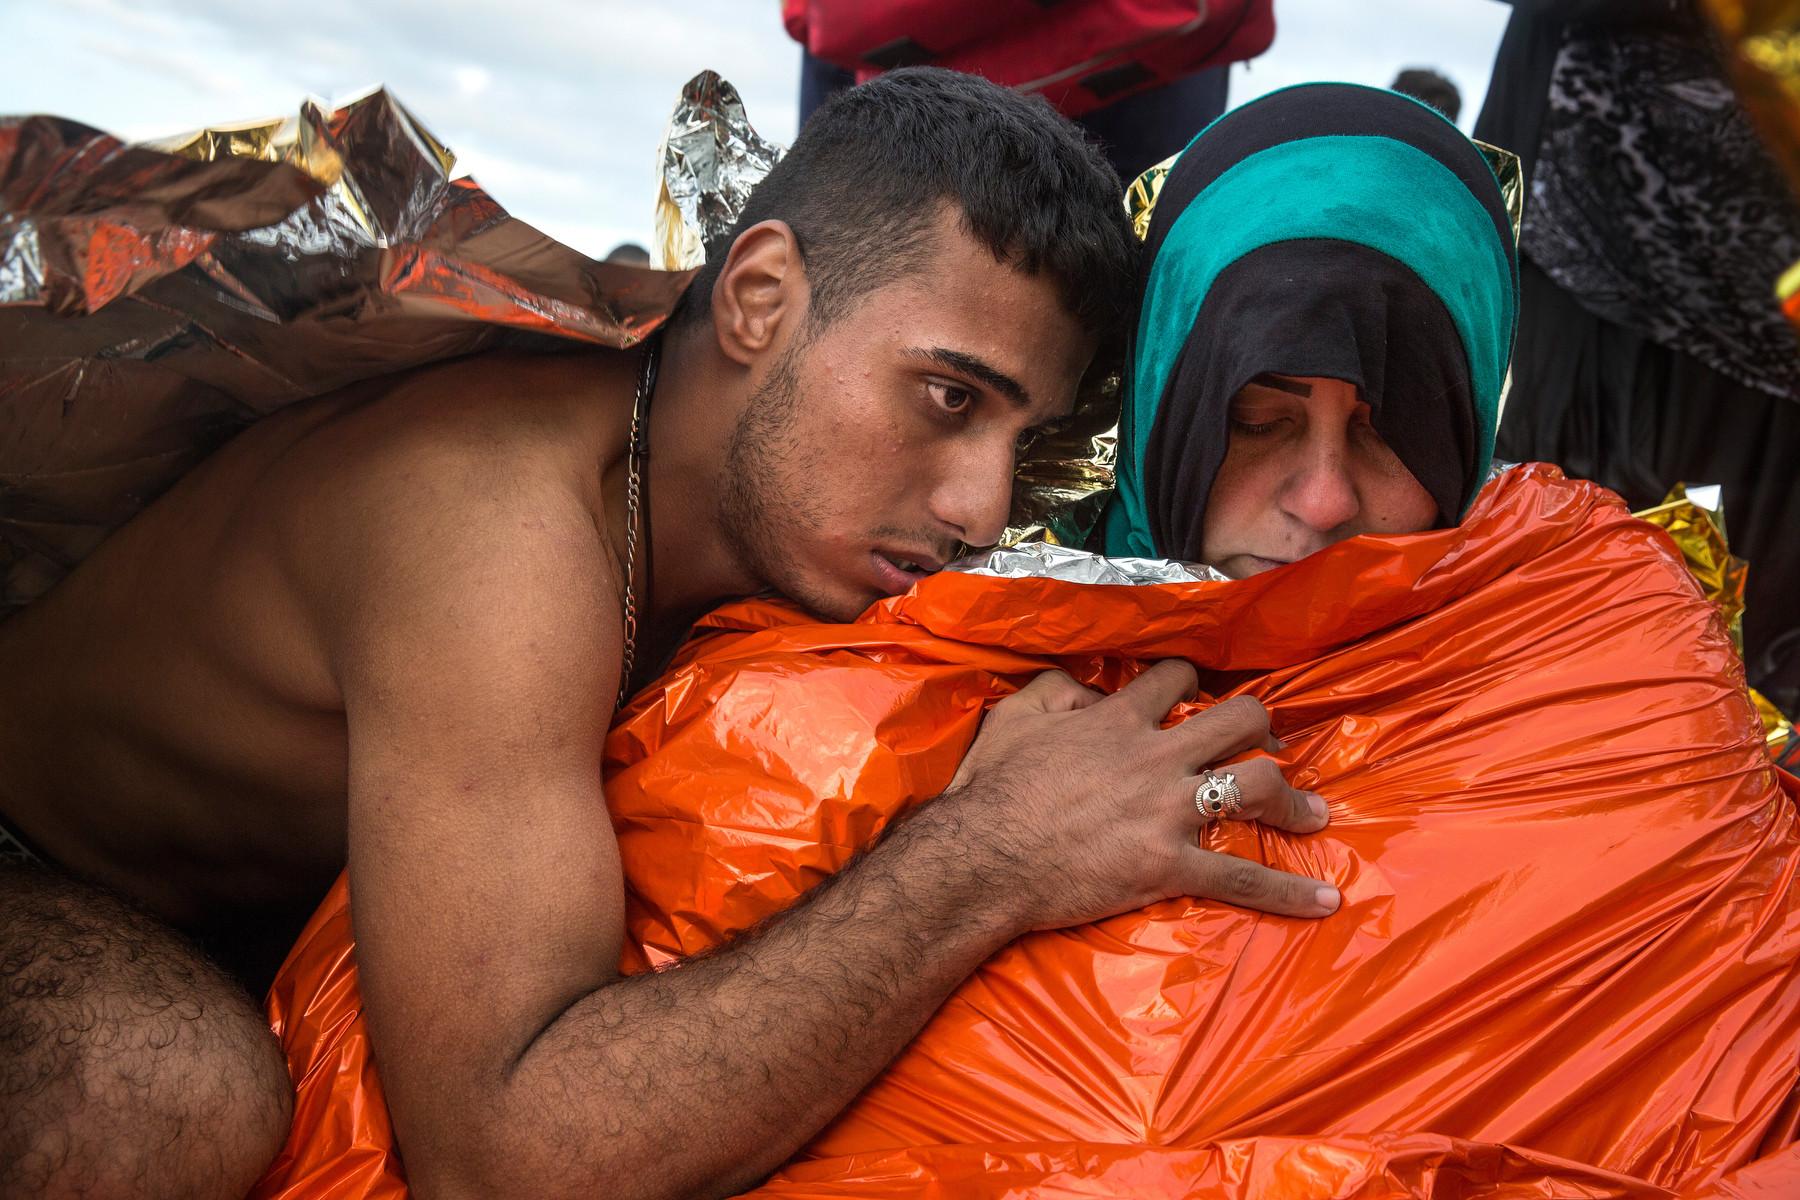 Un hombre sirio abraza a su esposa que está recibiendo atención médica por hipotermia. Lesbos (2015). Paula Bronstein/Getty Images